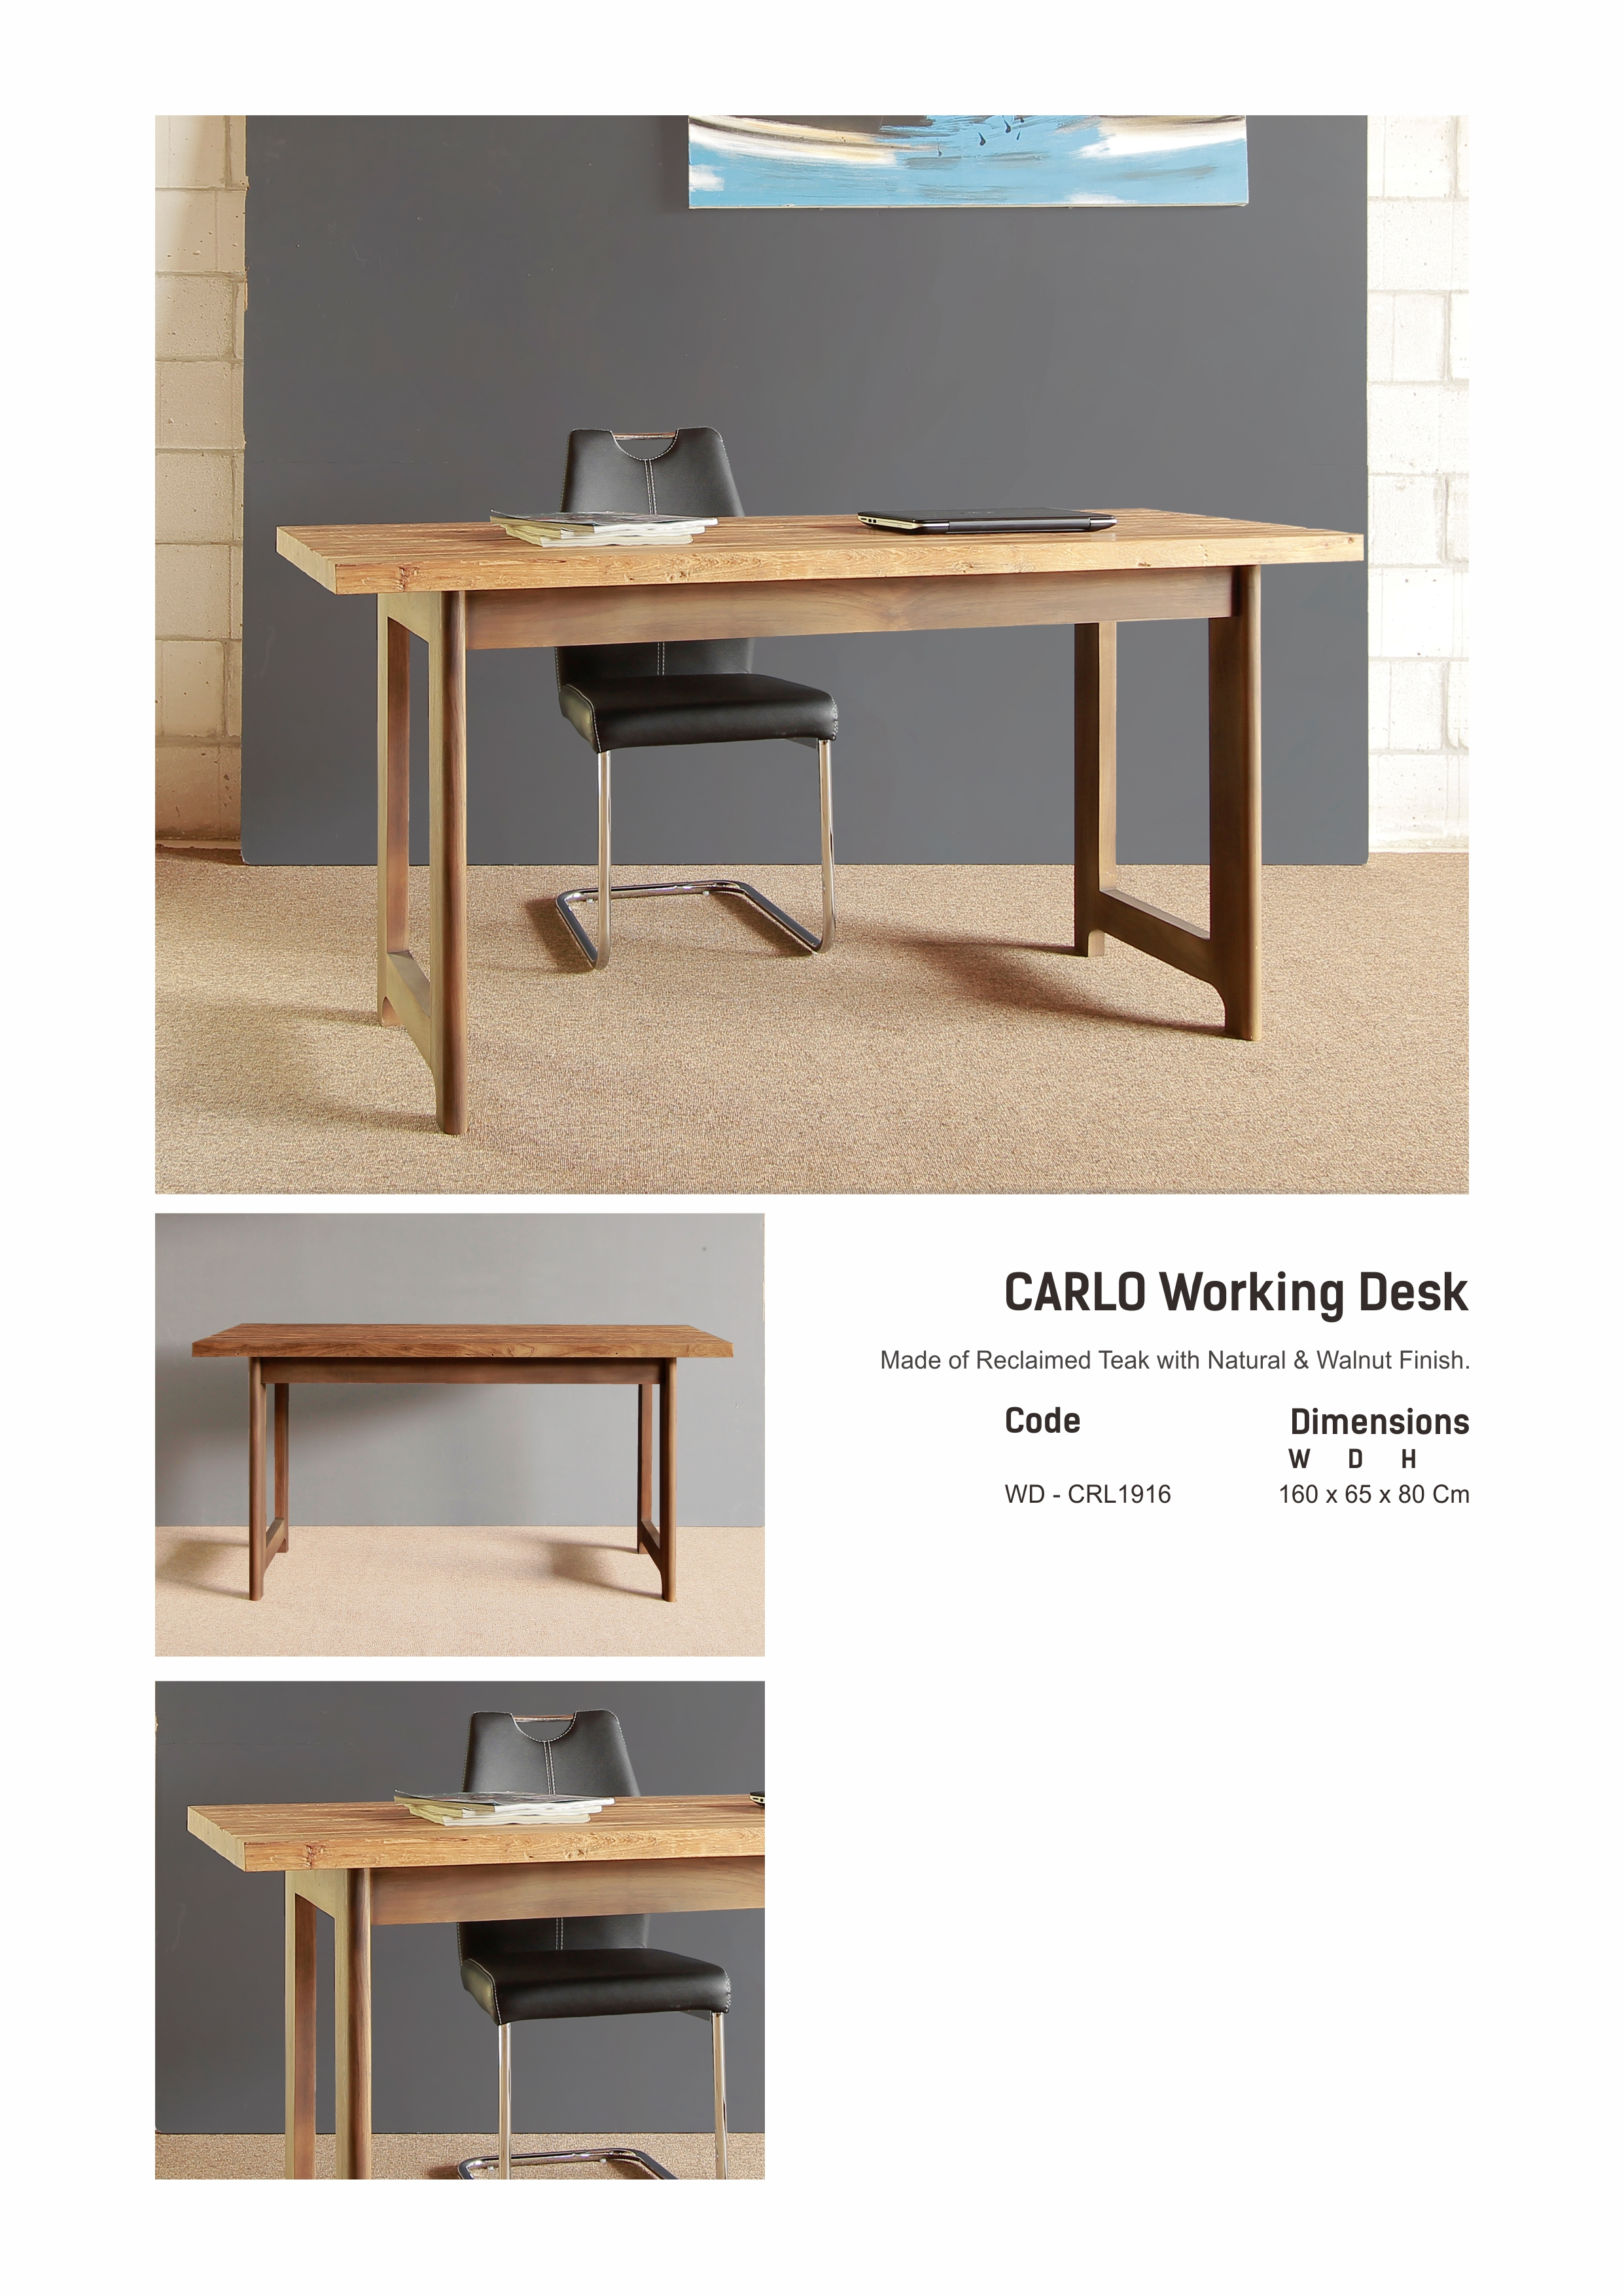 19. CARLO Working Desk